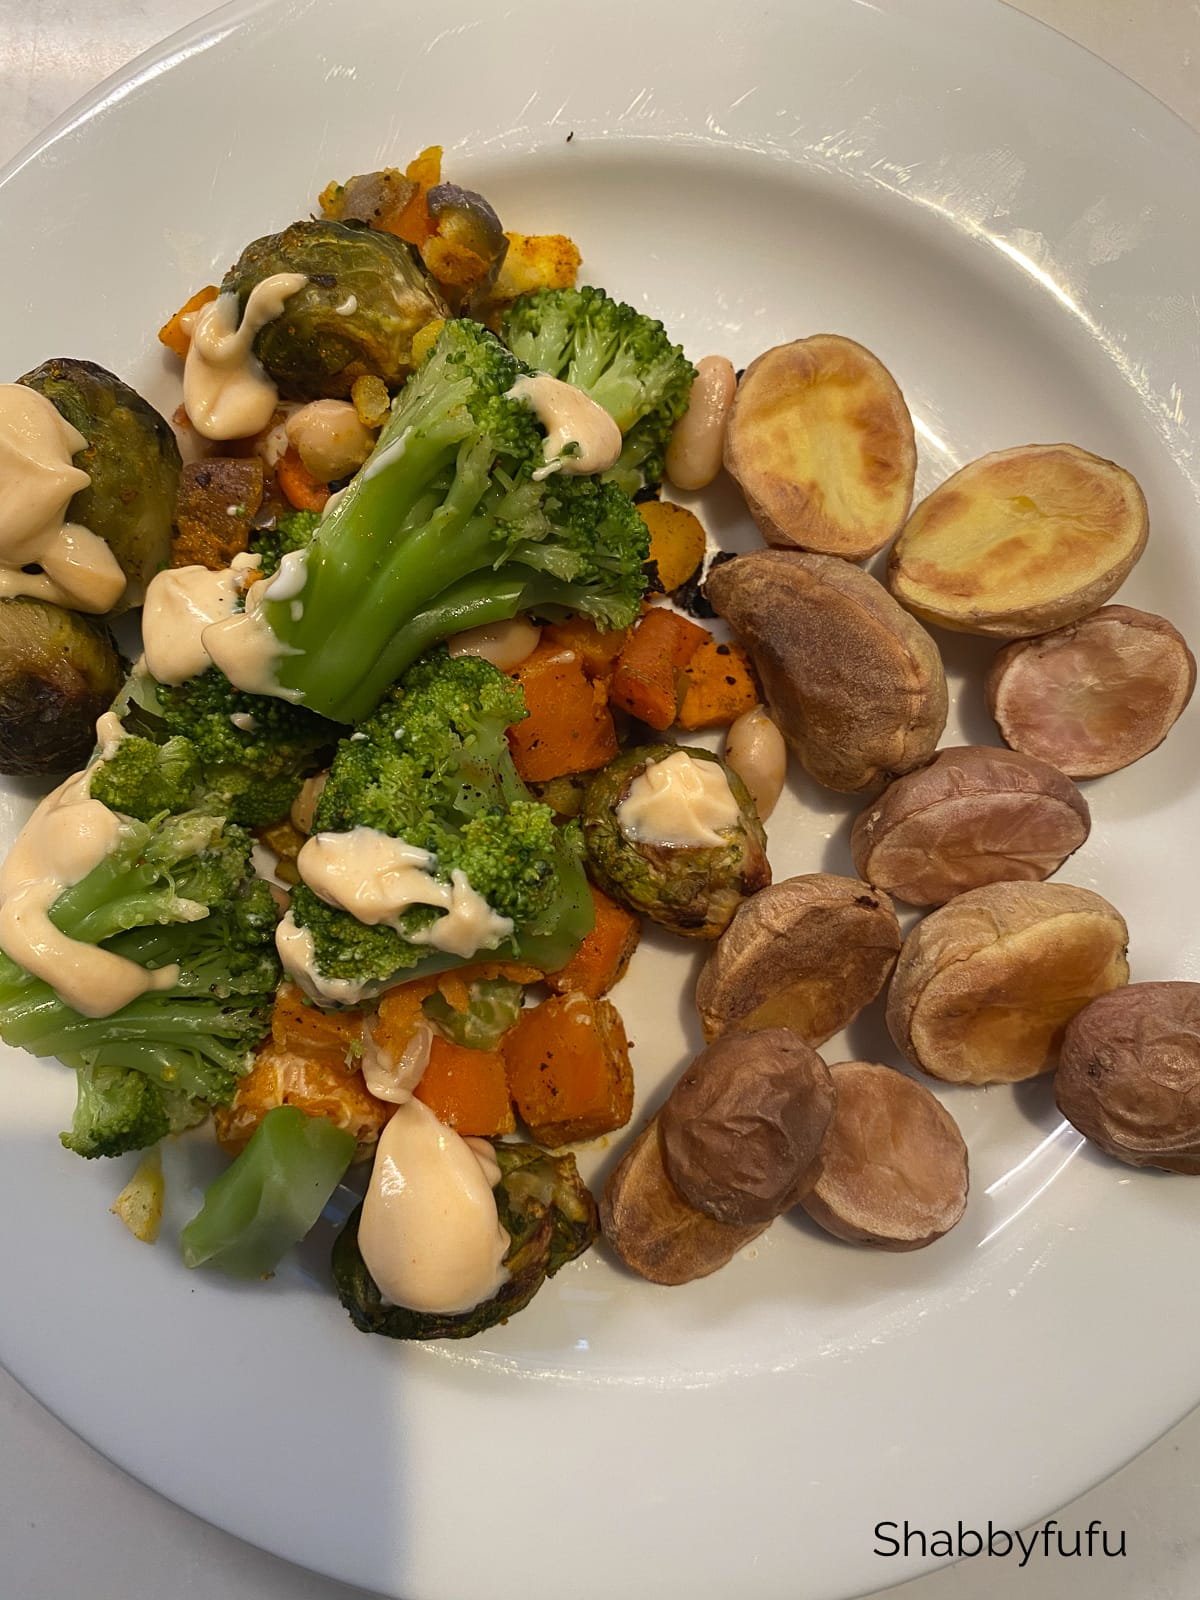 50/50 plate of veggies and potatoes